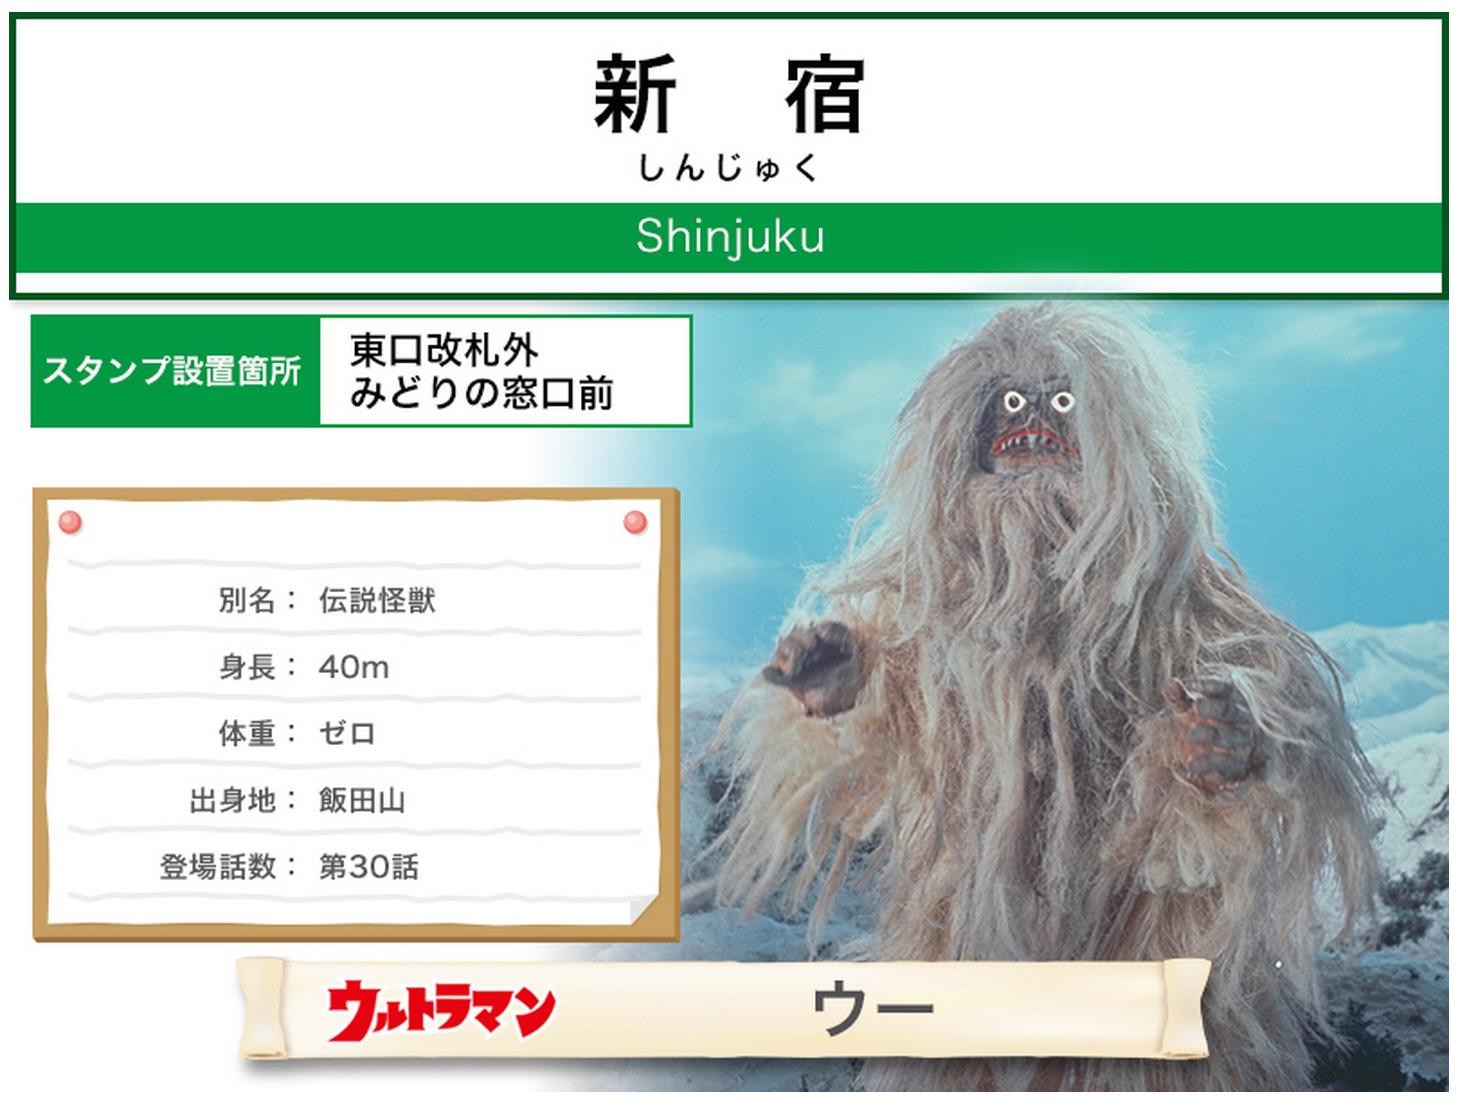 ultraman stamp rally jr east station train kaiju monster retro science fiction